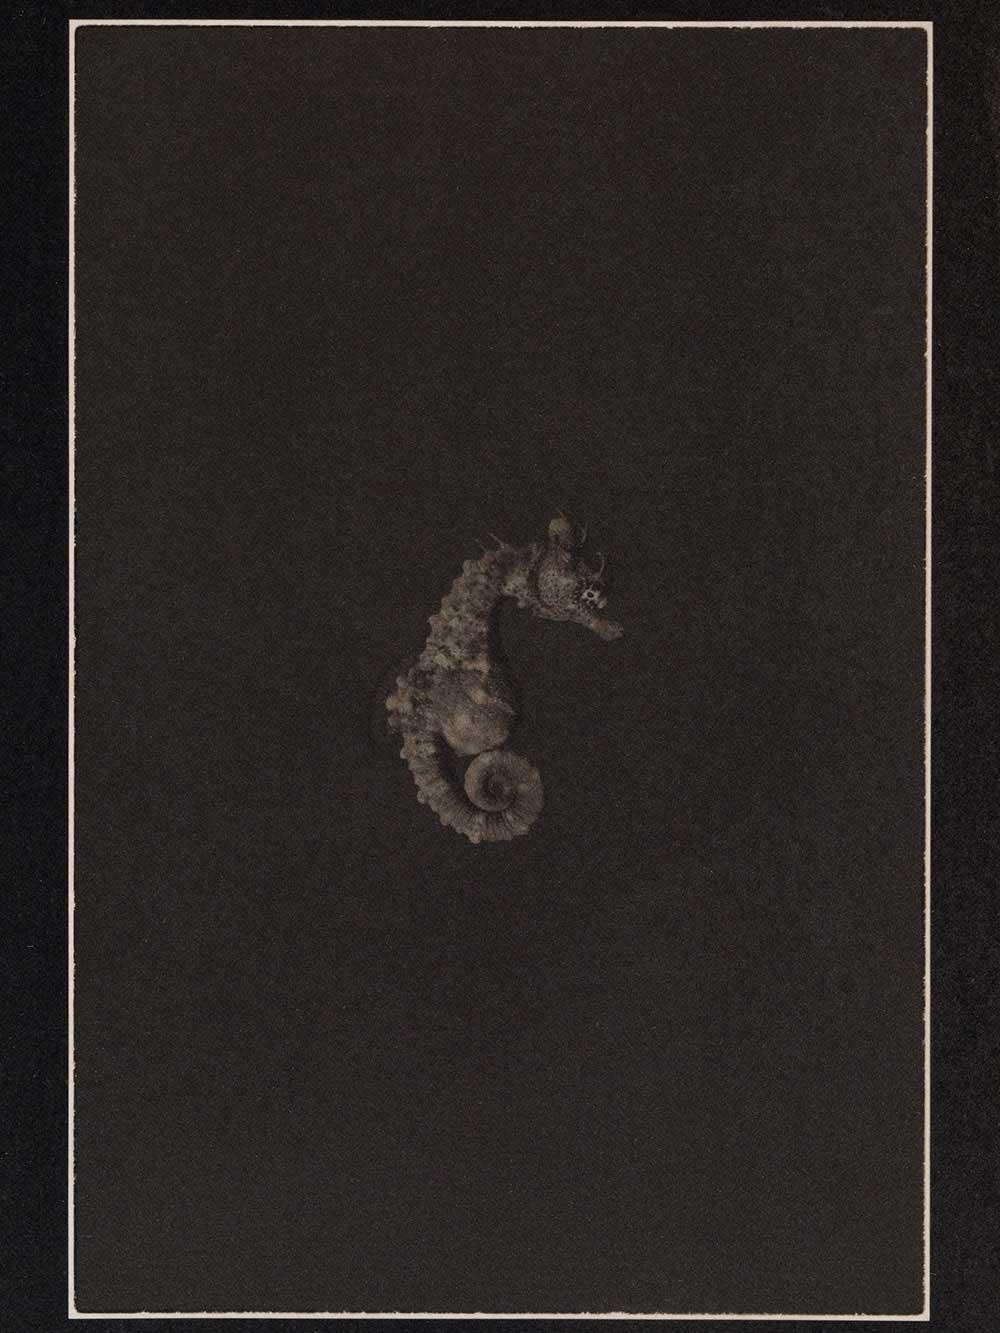 LLP_Shorthead-Seahorse-Figure-1.1